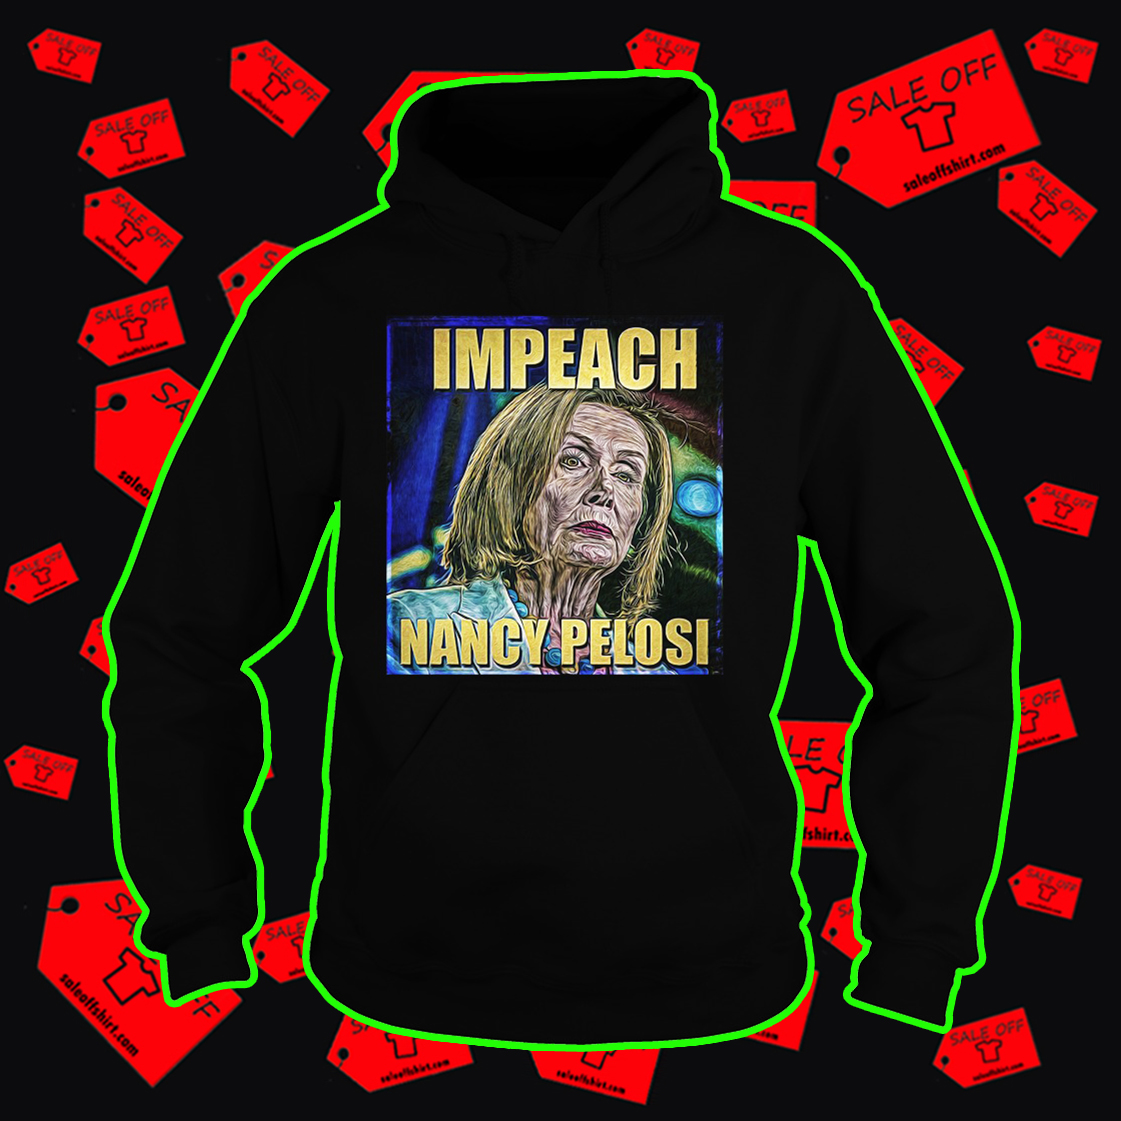 Impeach Nancy Pelosi hoodie